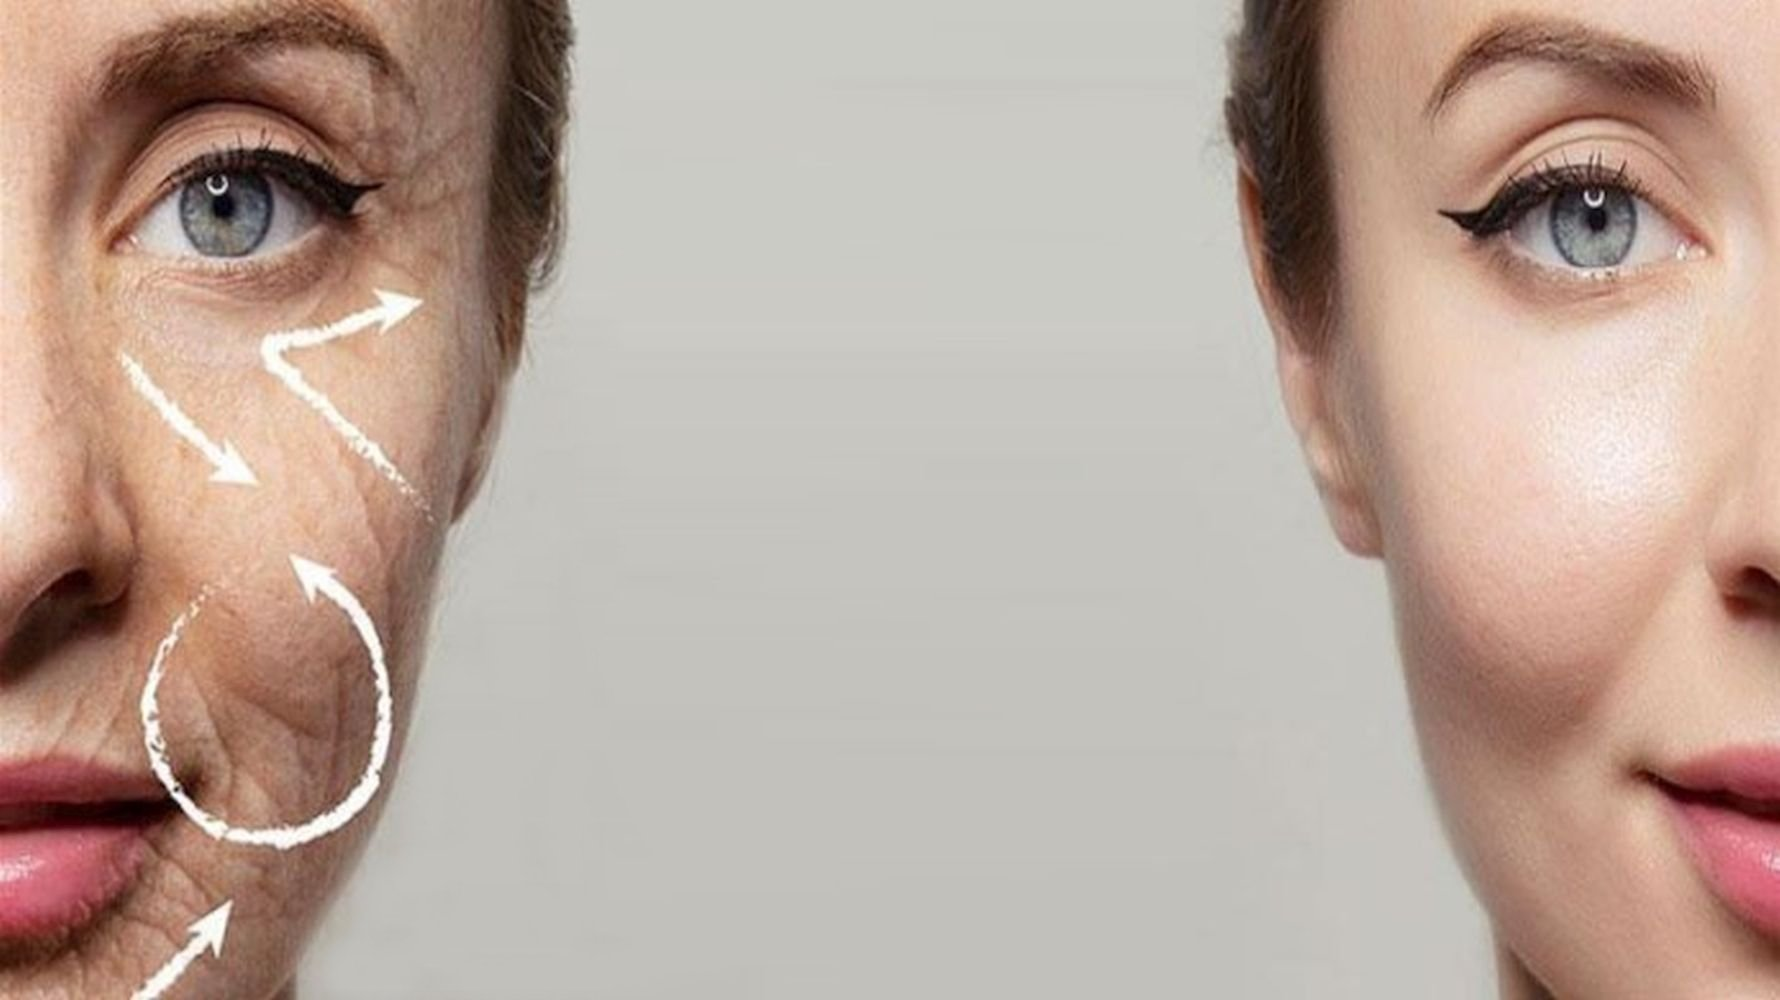 Environmental factors make people aging fast